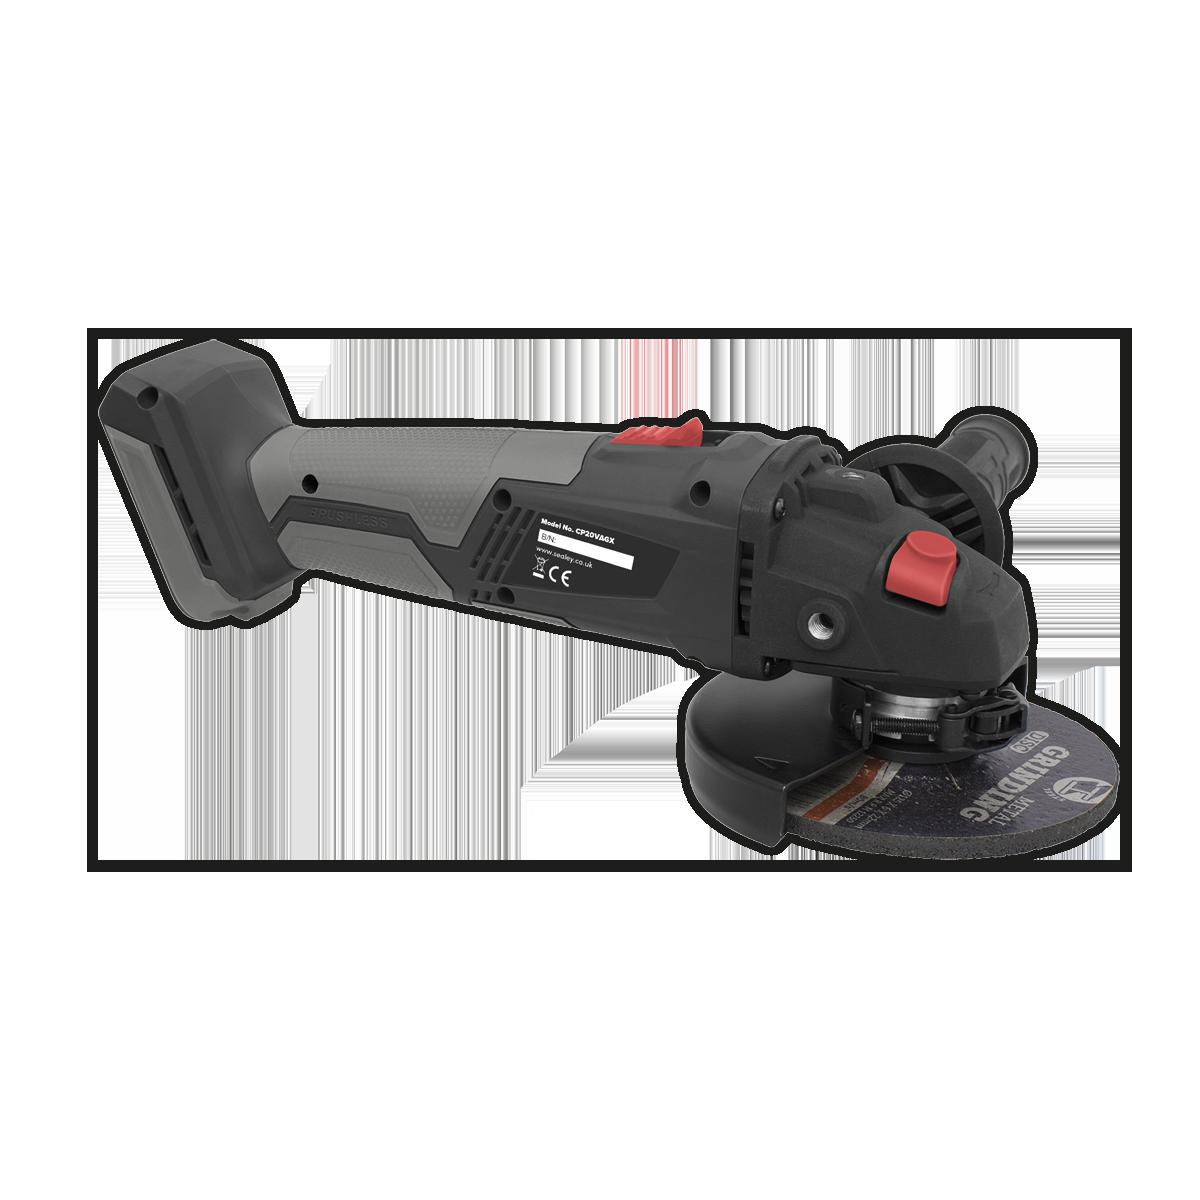 Brushless Angle Grinder Ø115mm 20V - Body Only